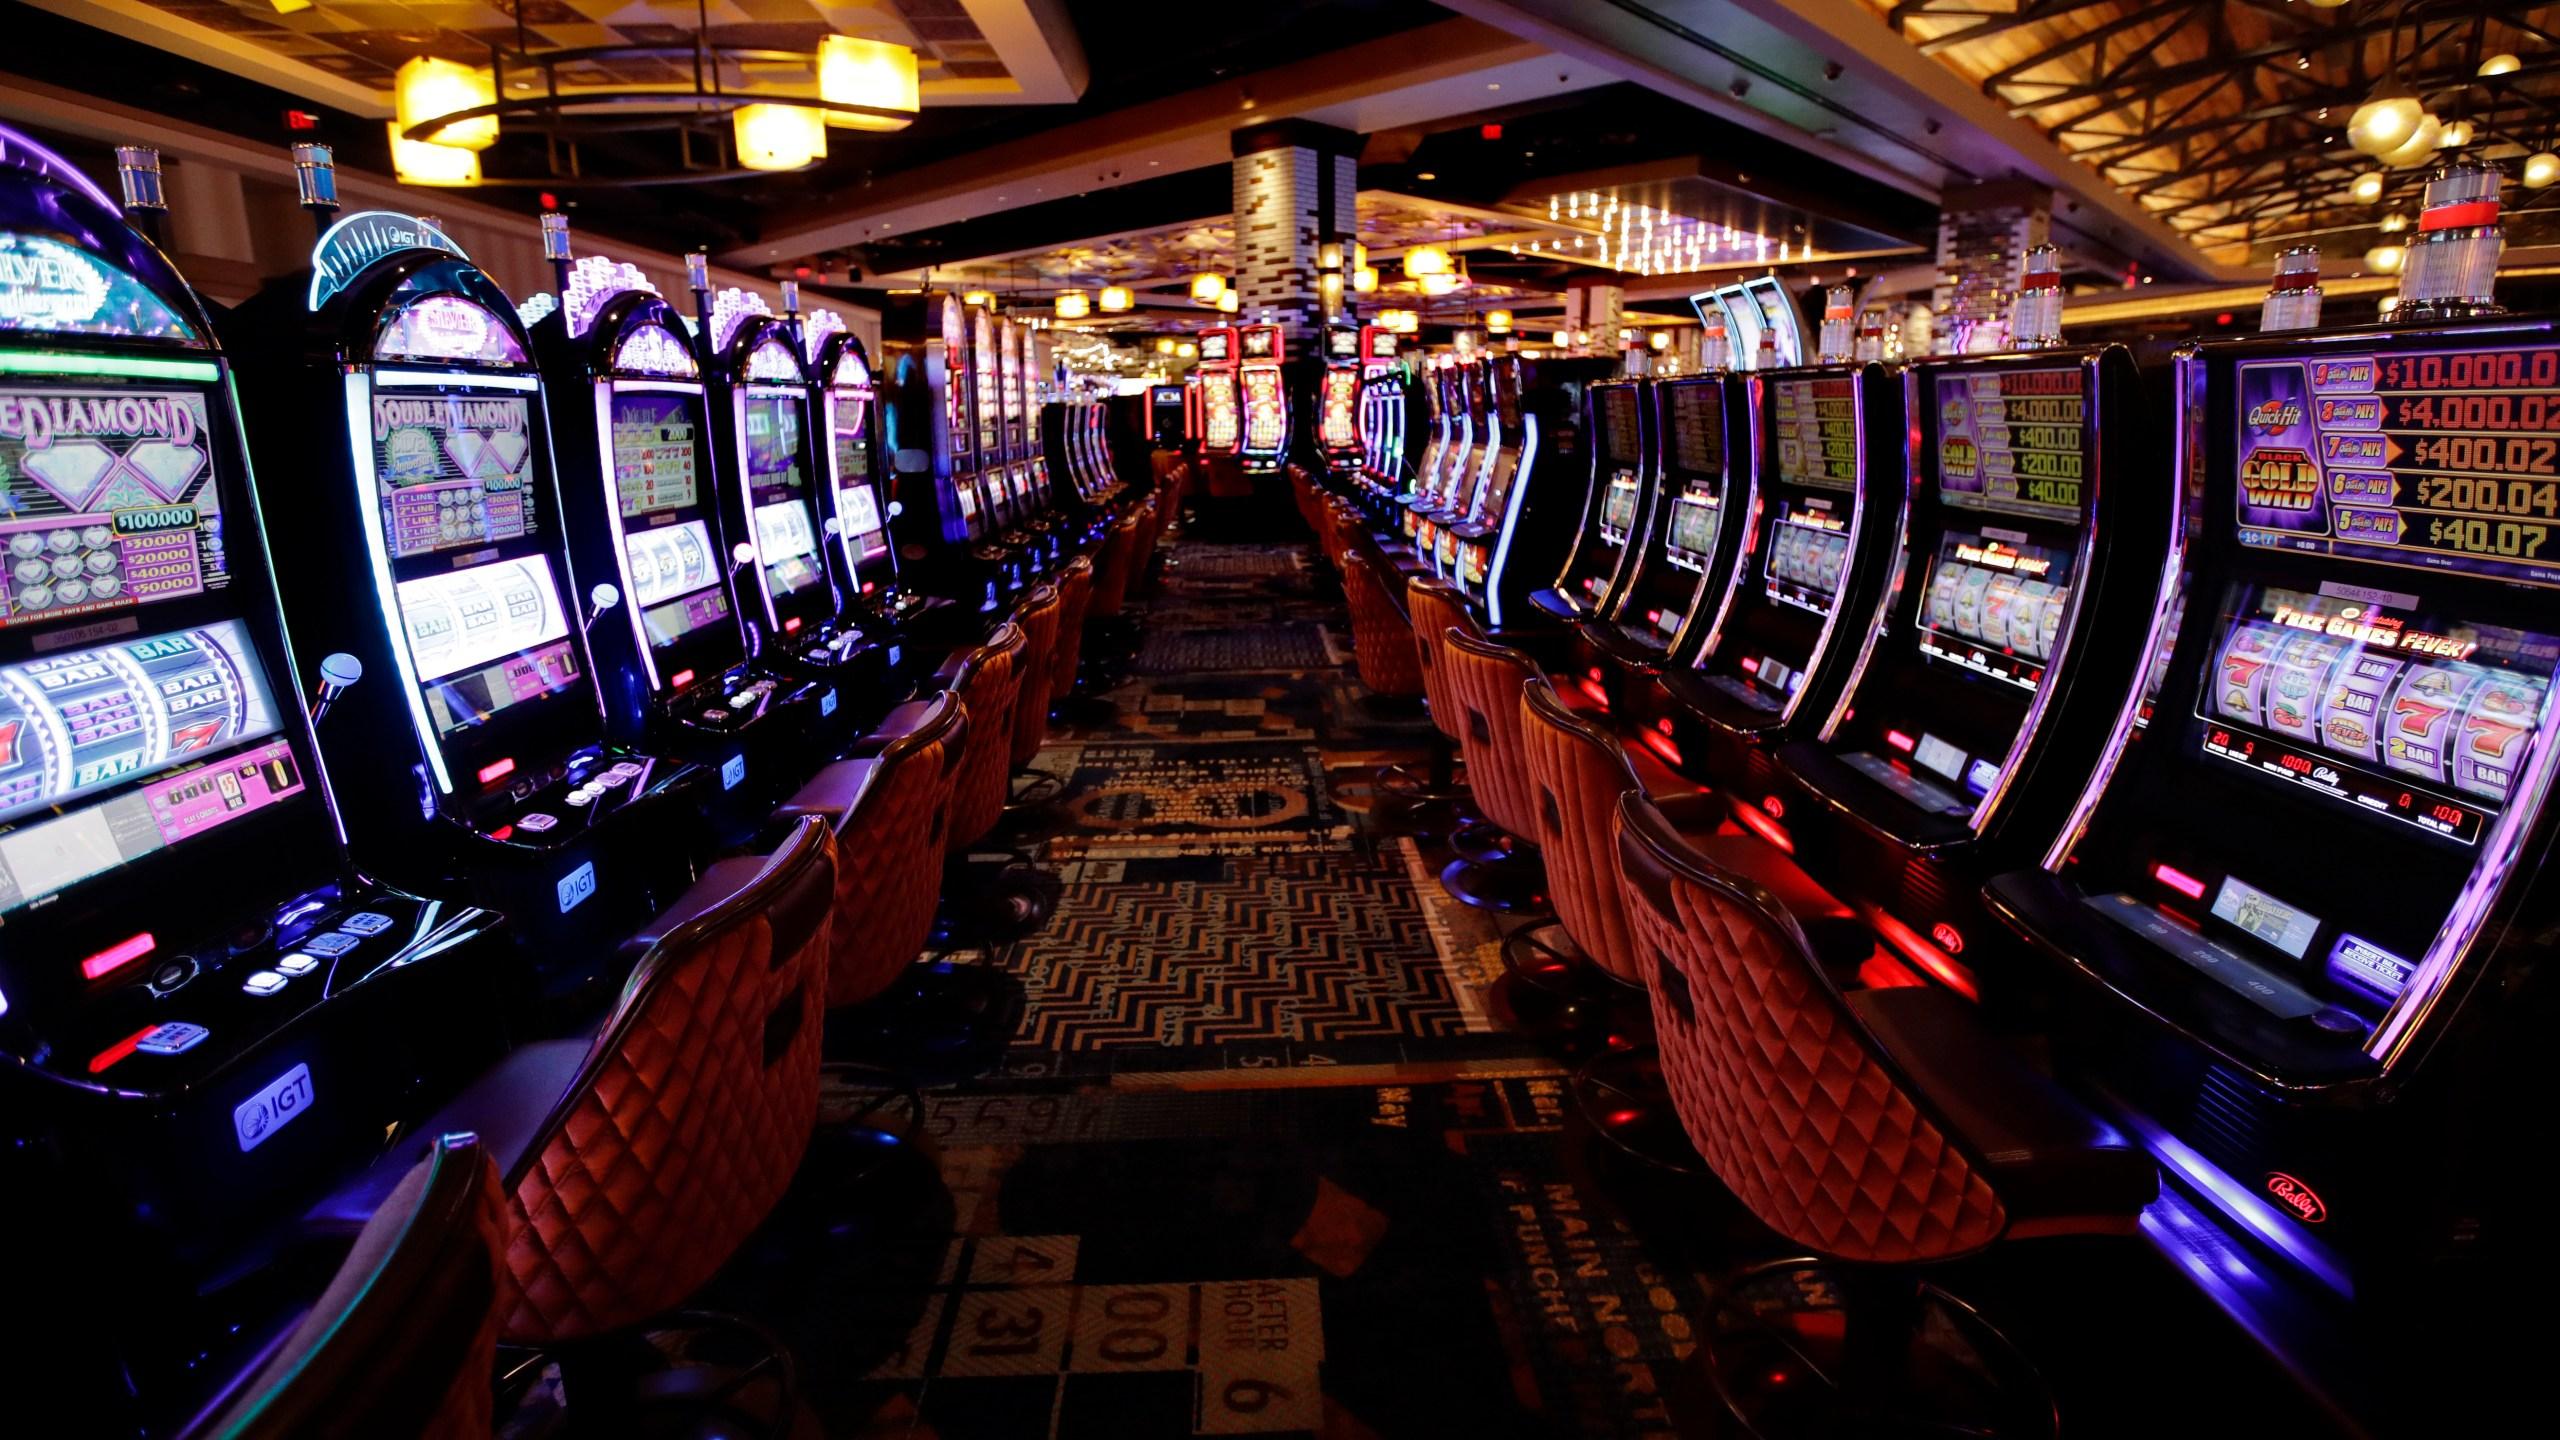 Springfield_Casino_64889-159532.jpg48755473